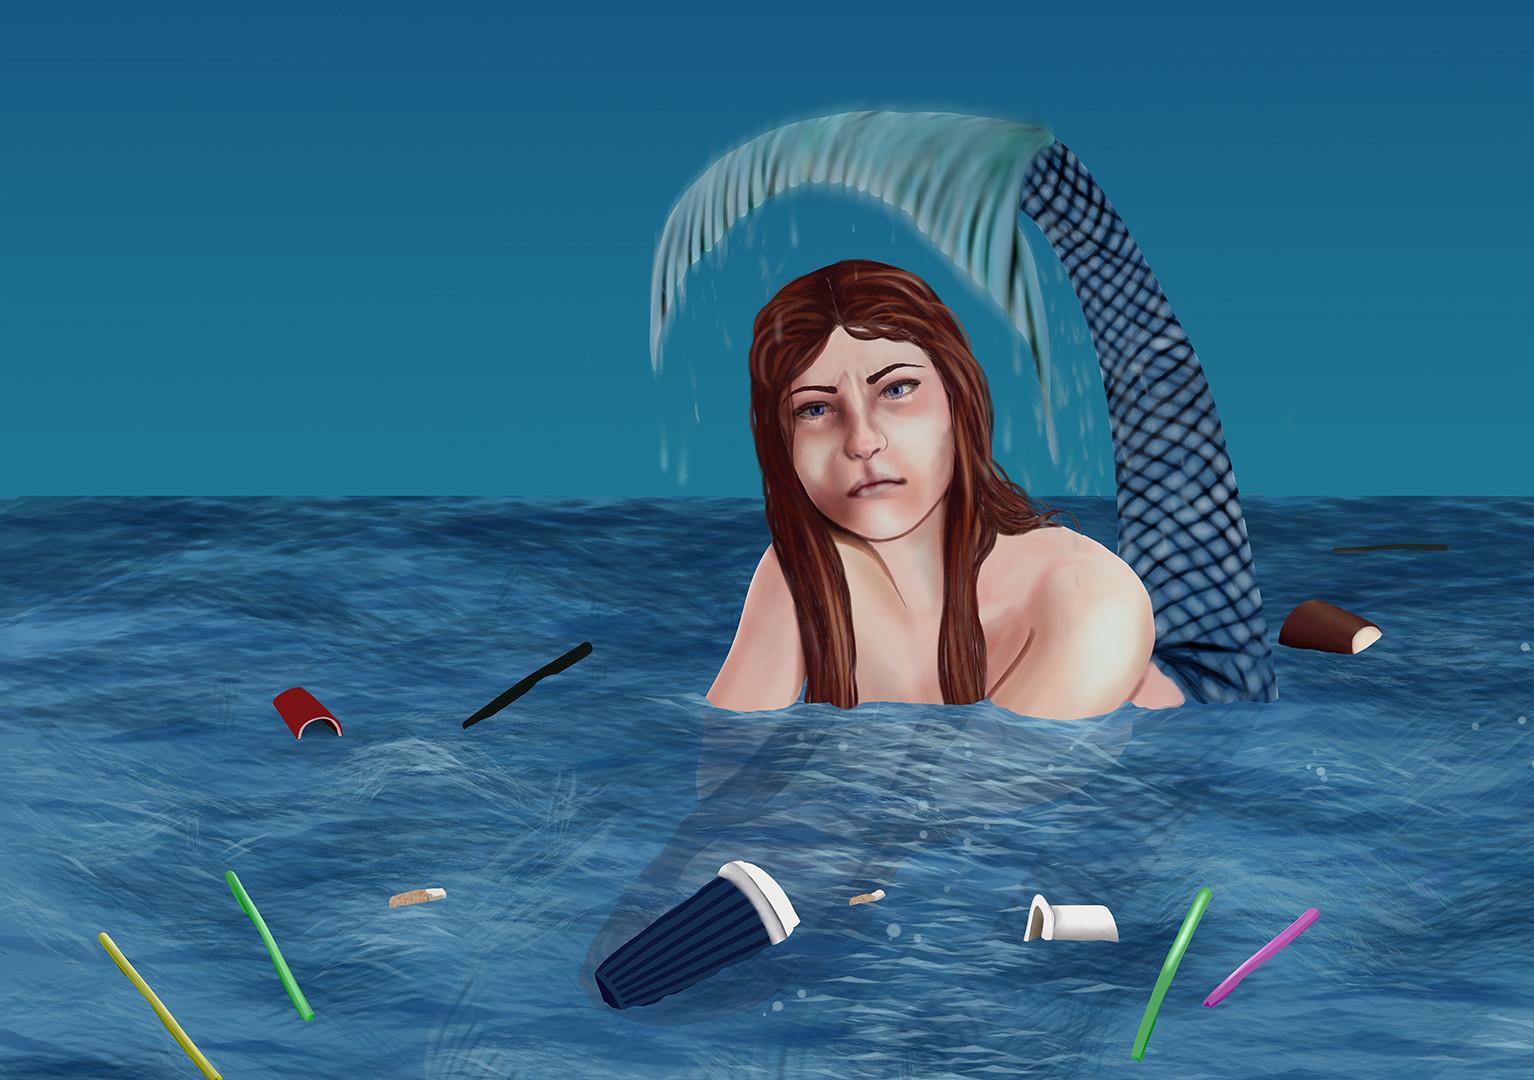 The Unhappy Mermaid